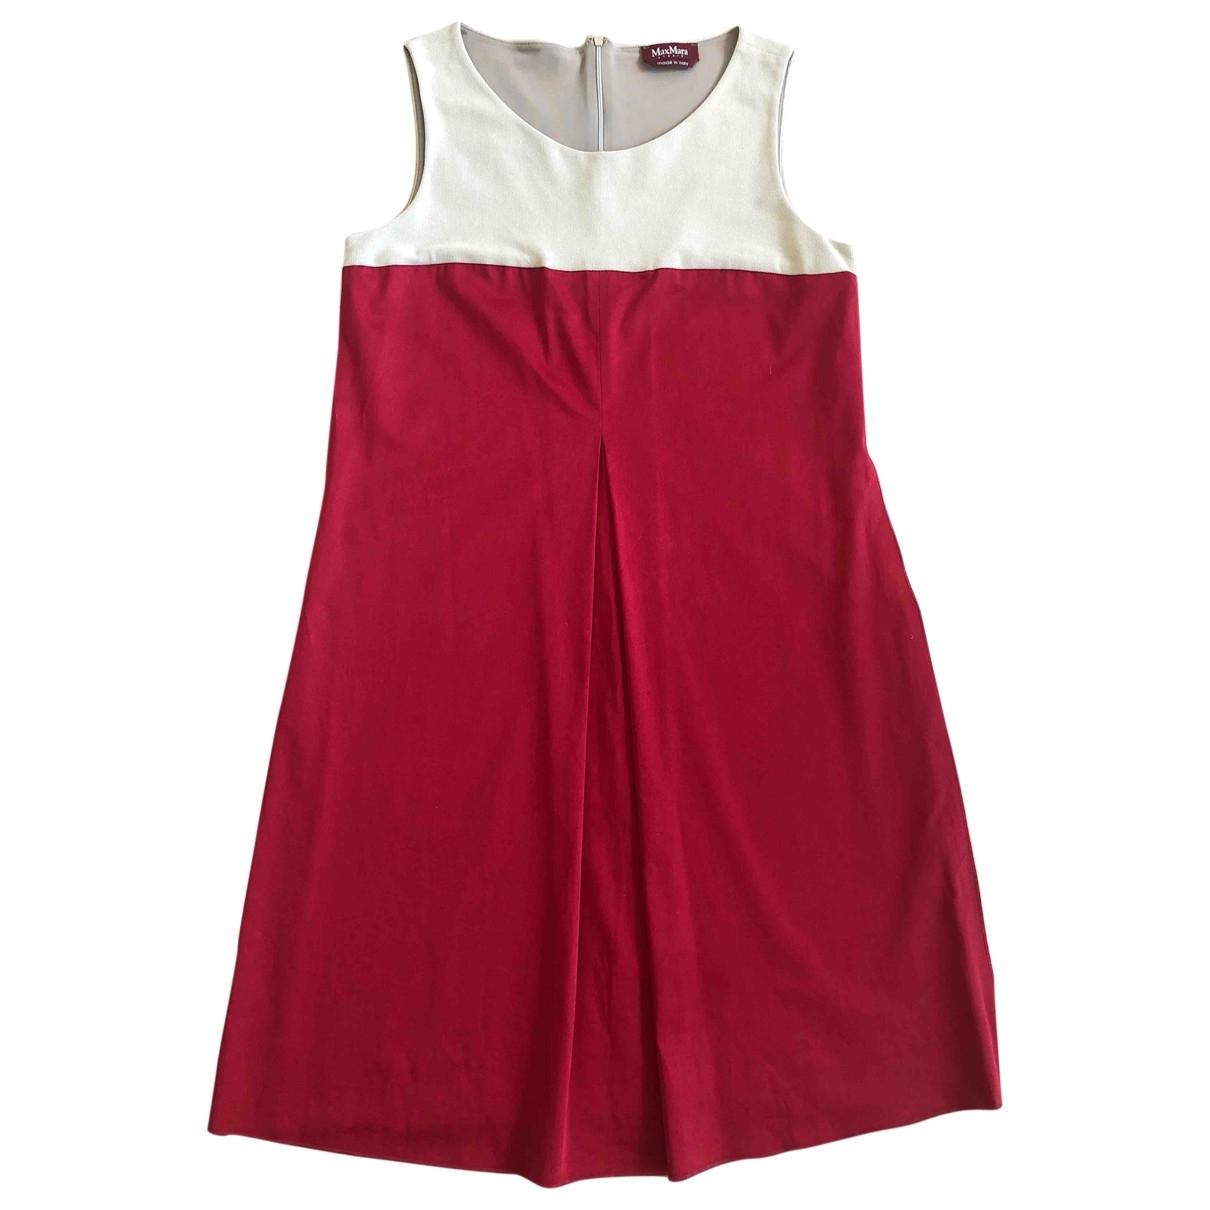 Max Mara Studio \N Red Cotton - elasthane dress for Women 48 IT